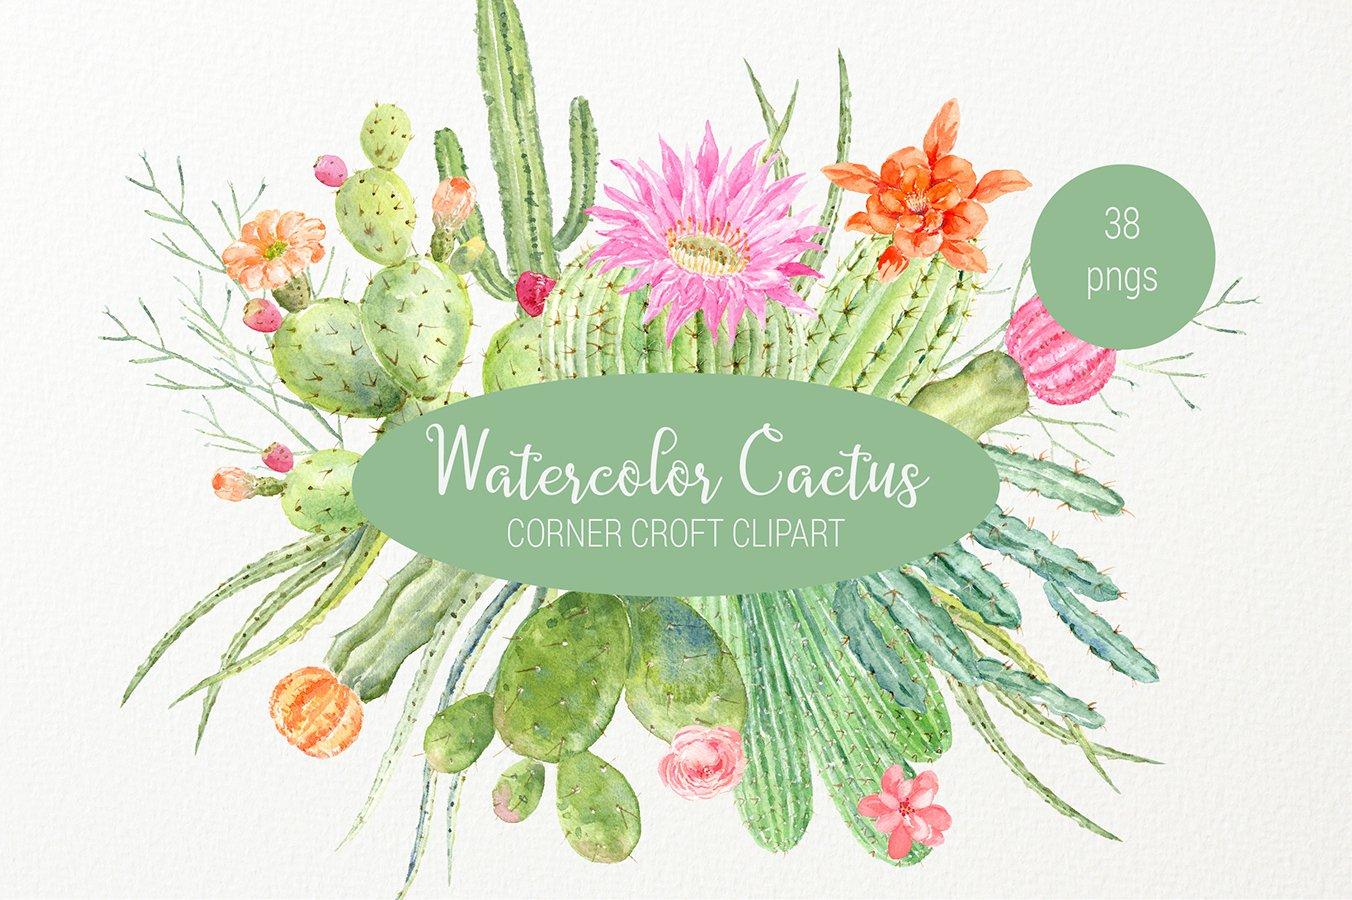 Watercolor cactus clipart, detailed botanial cactus graphics.